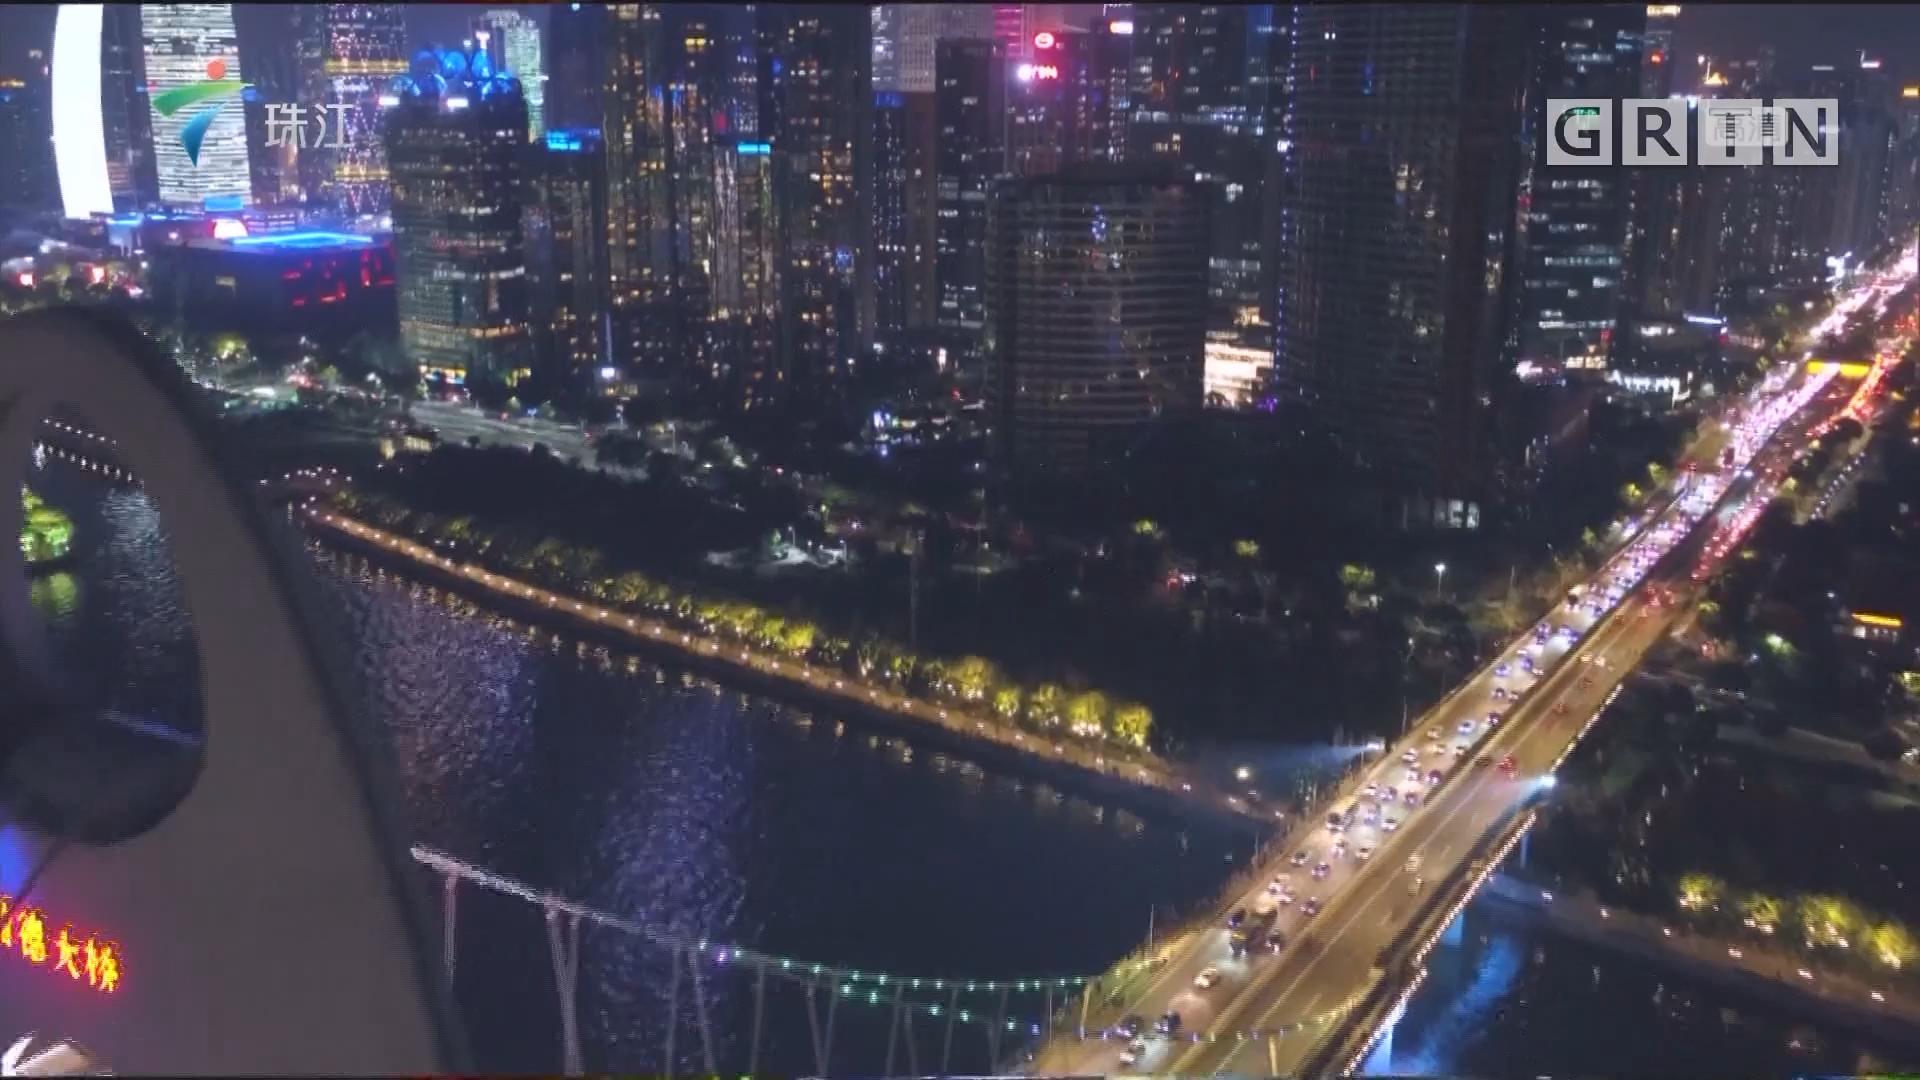 [HD][2019-07-20]外来媳妇本地郎:反逼婚协议书(上)